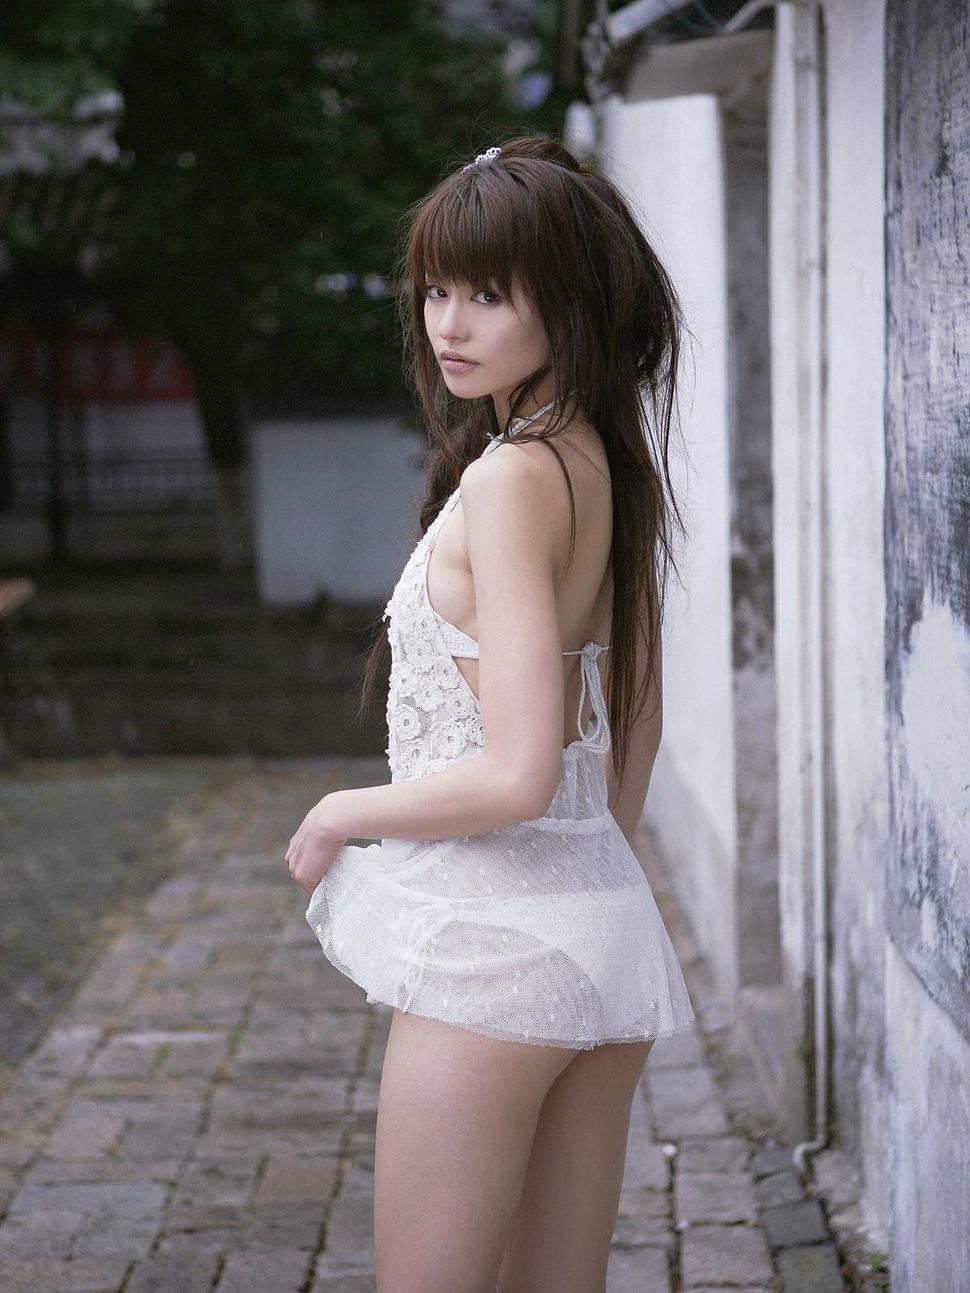 http://blog.cnobi.jp/v1/blog/user/a8c5c06266ed65ea9b67299e90592fa7/1292805643